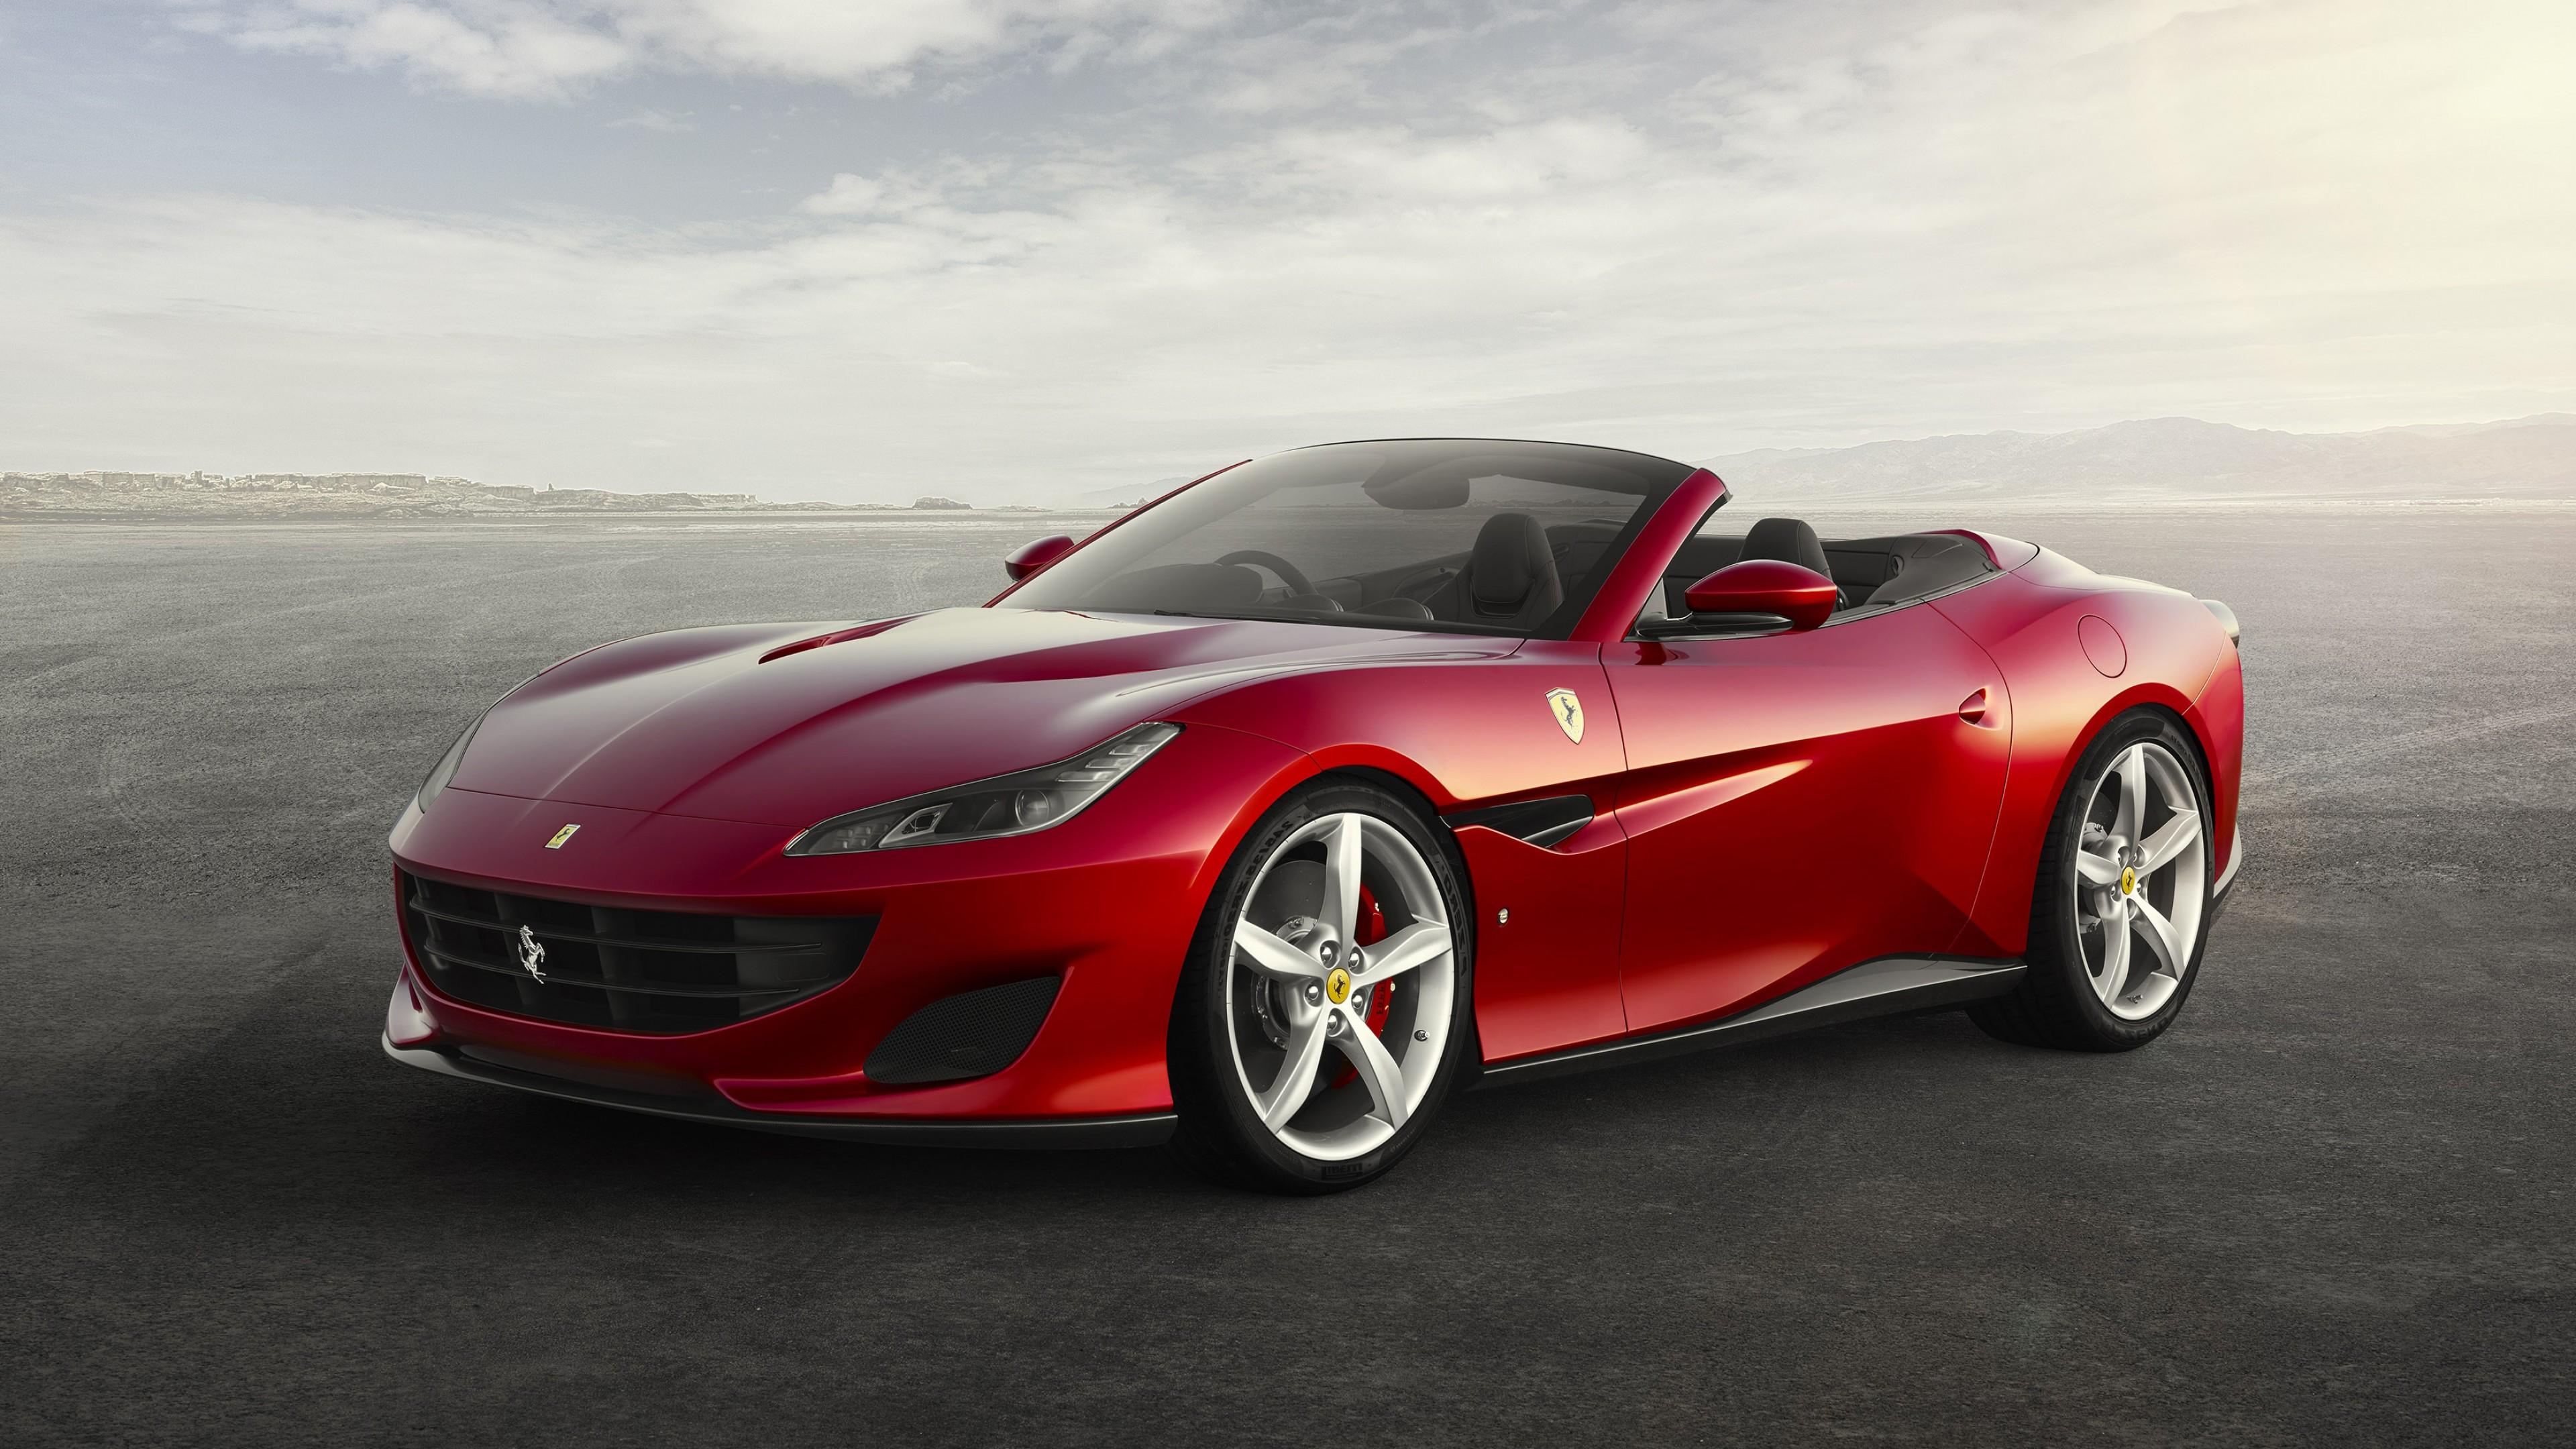 Wallpaper Ferrari Portofino GT, 2018 Cars, 4K, Cars